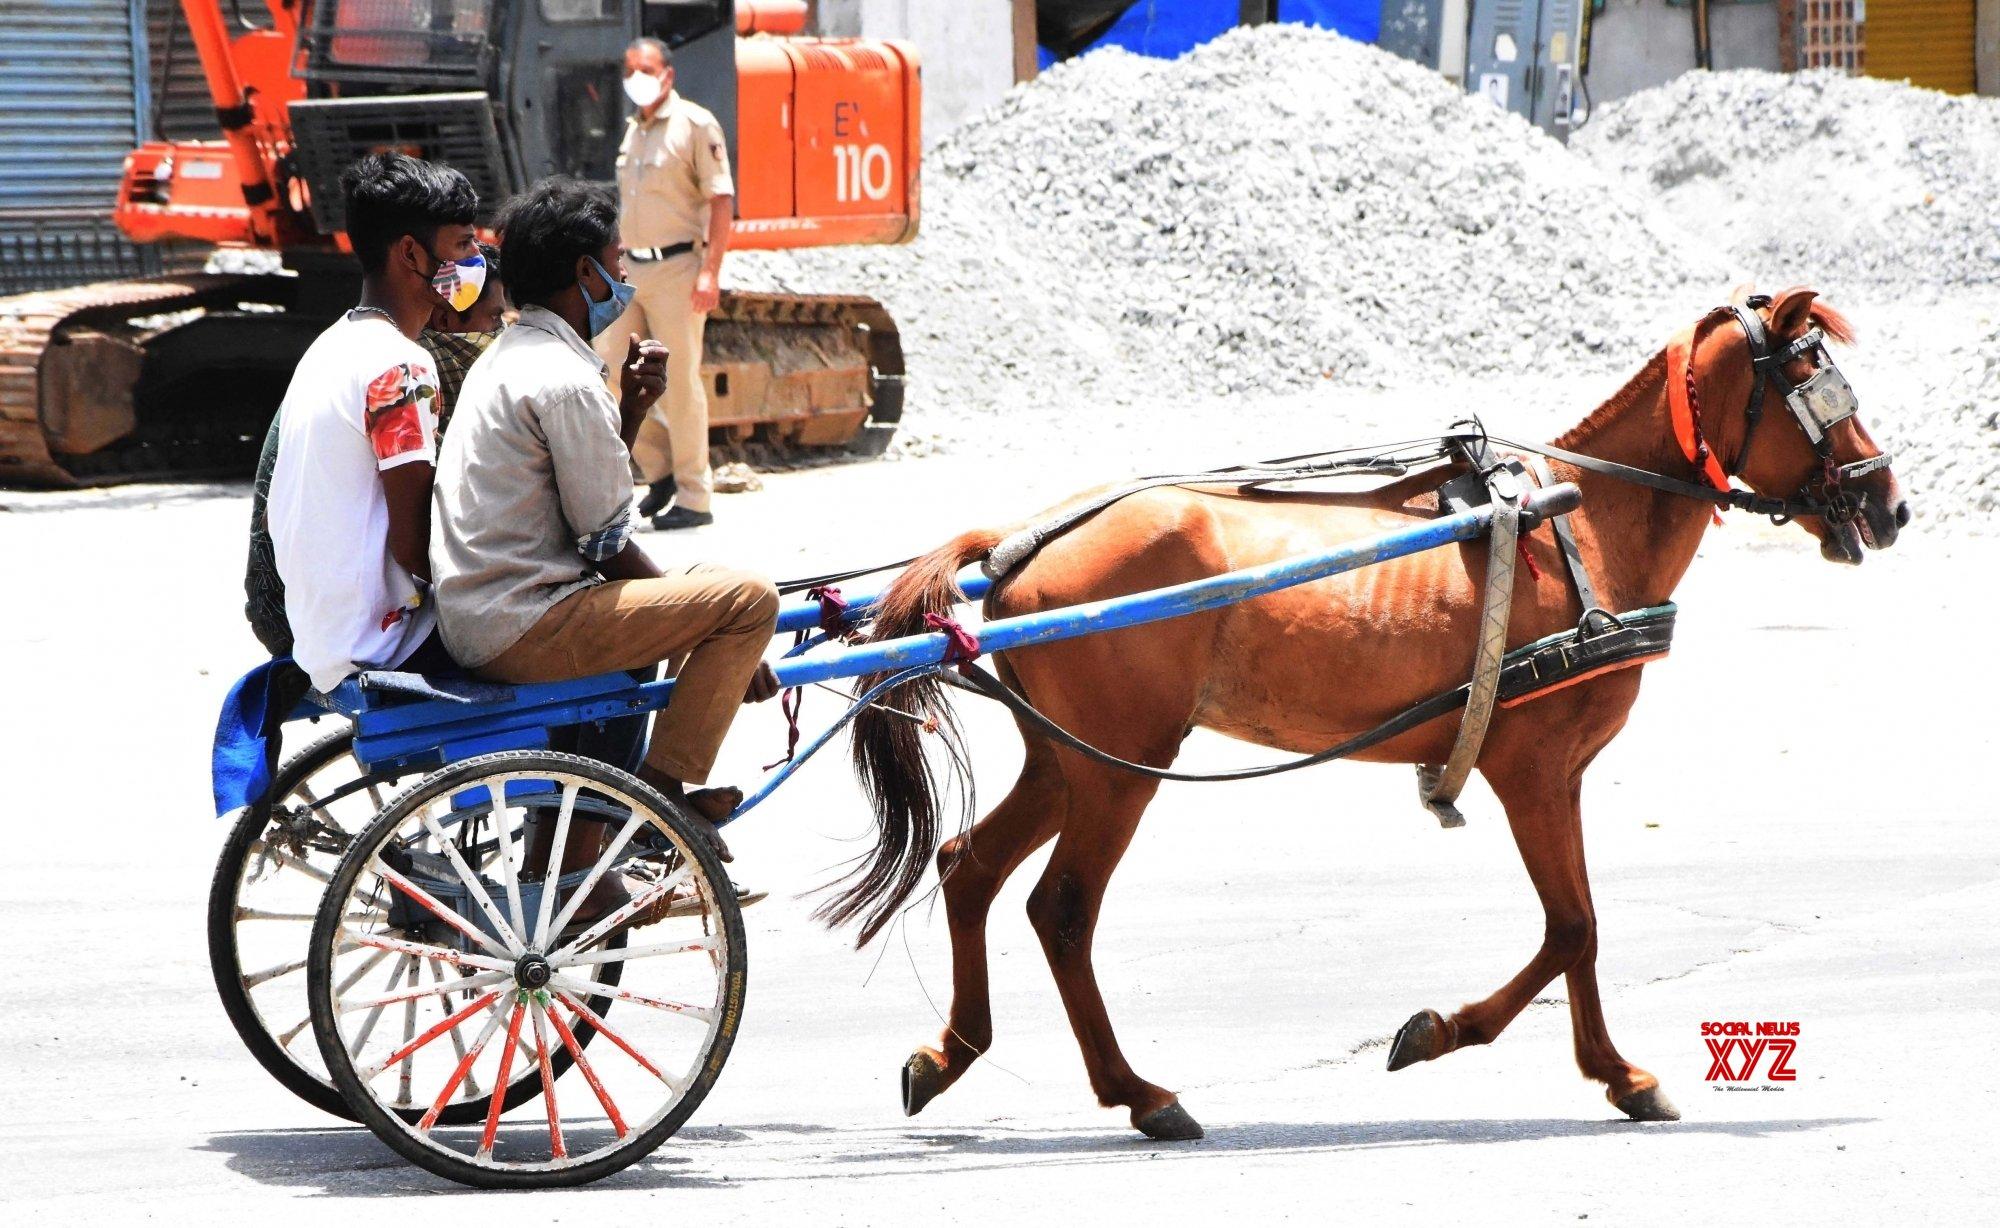 Bengaluru : People using horse carts to reach their destination at KR Market during lockdown in Bengaluru. #Gallery